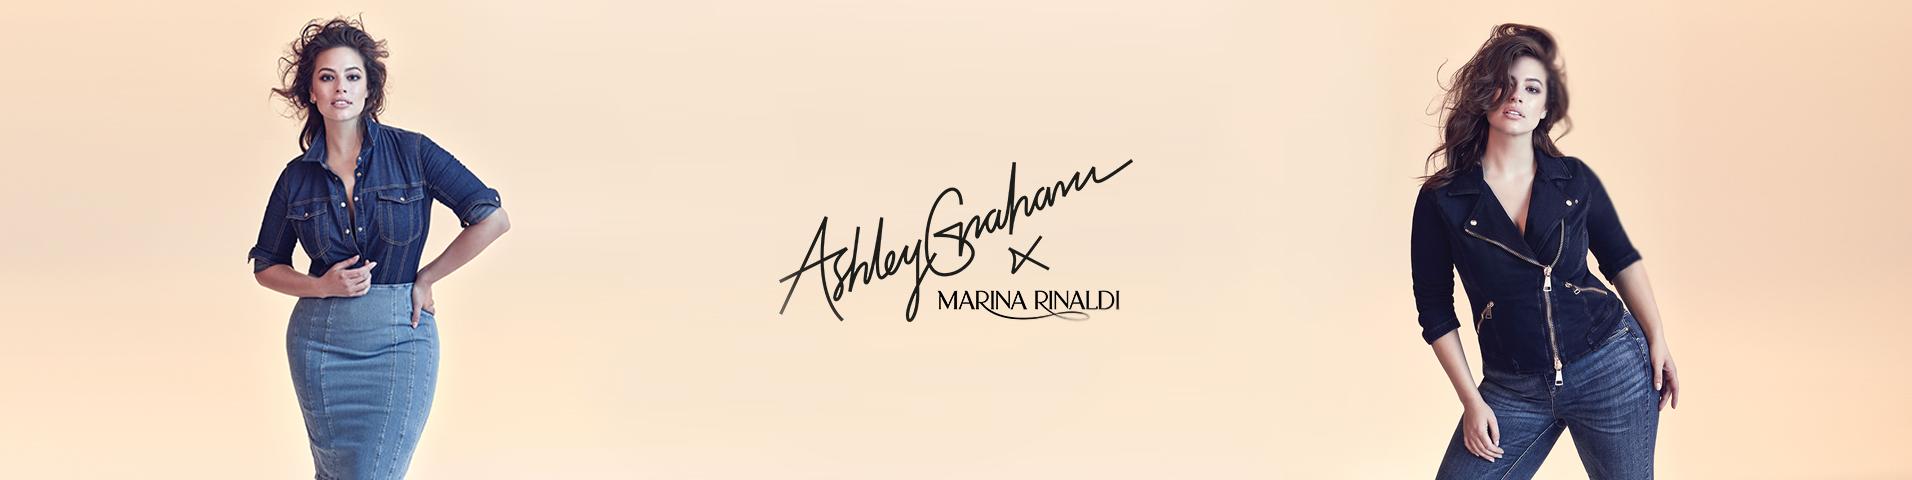 Ashley Graham x Marina Rinaldi Online Shop  02f60ce0e88